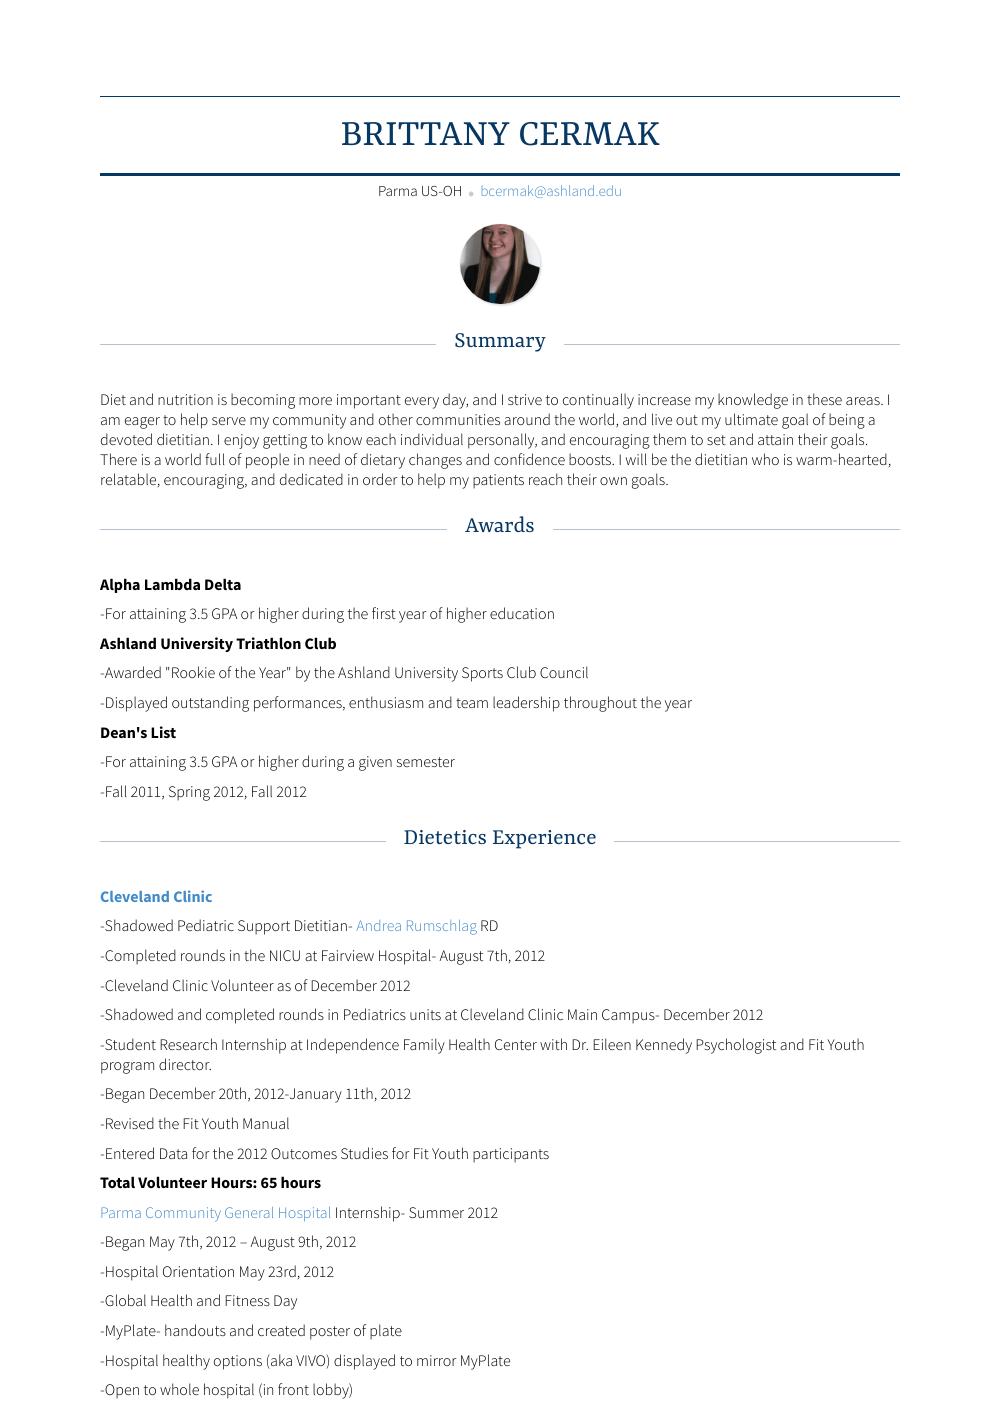 Lifeguard Resume Samples And Templates Visualcv